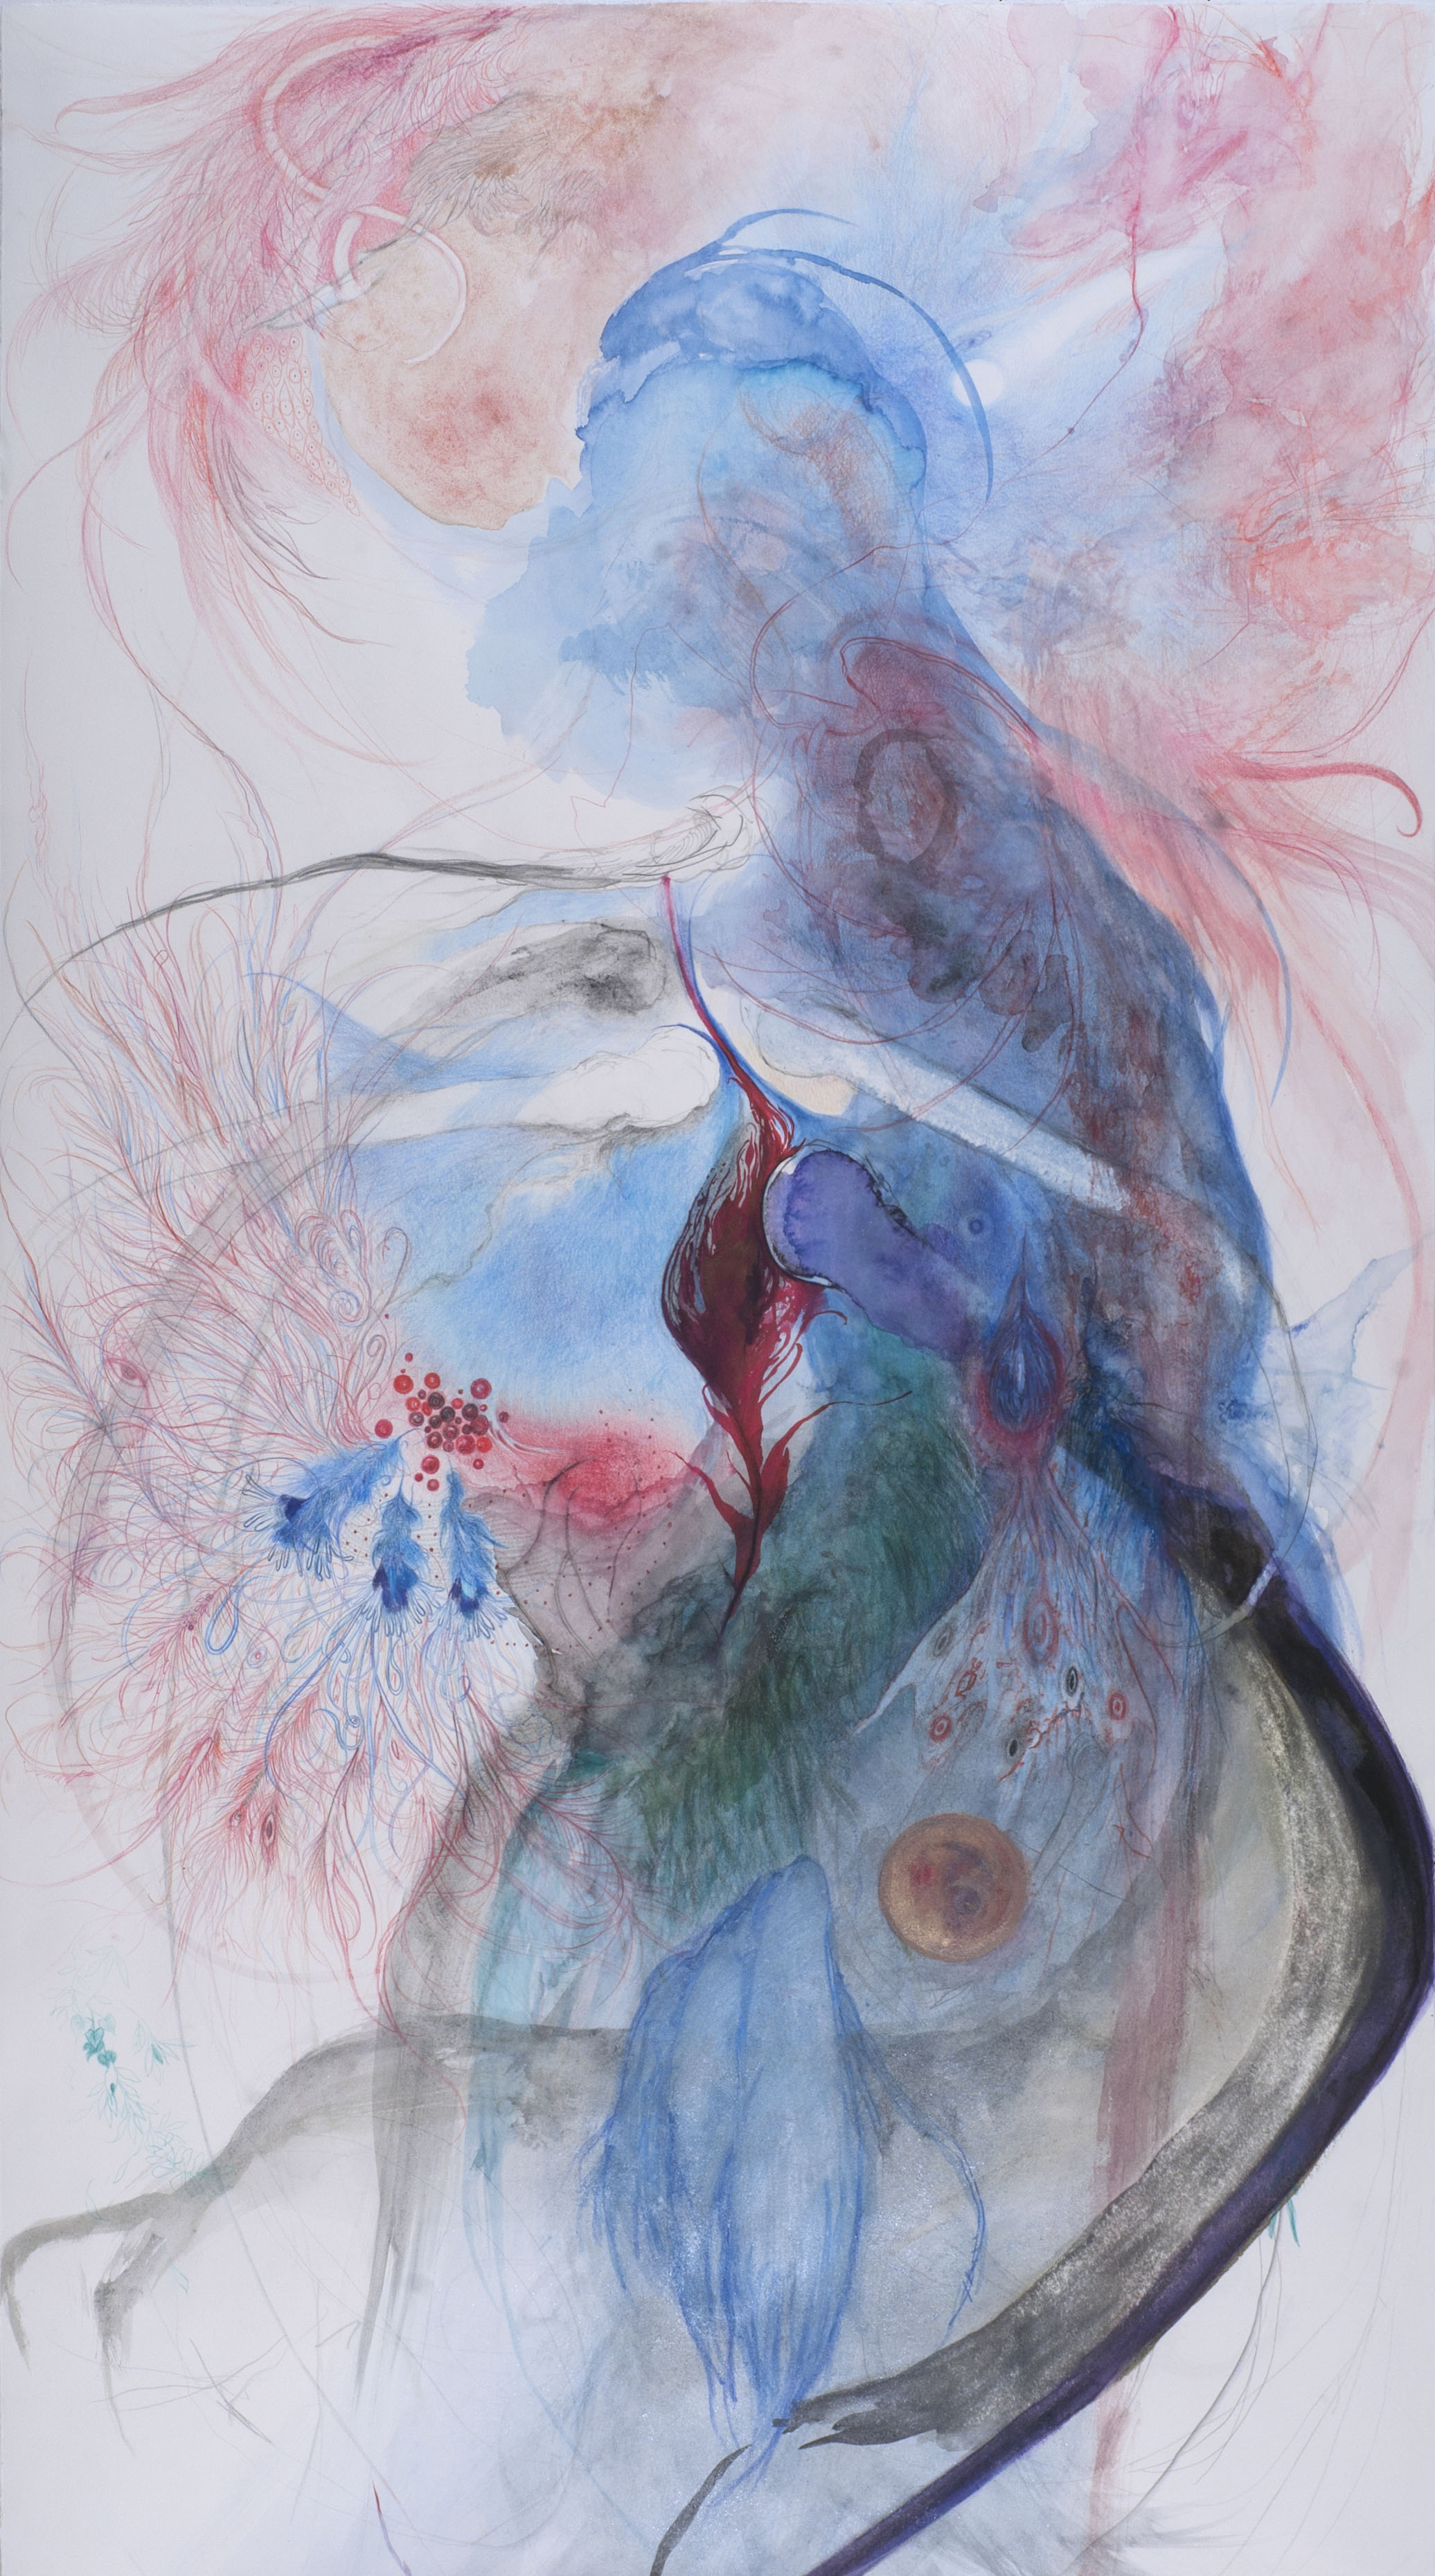 Bea Kwan Lim    Sehnsucht  , 2012 Colour pencil, graphite, handmade watercolour on paper 41.25 x 22.75 inches / 104.8 x 57.8 cm / BLi 5